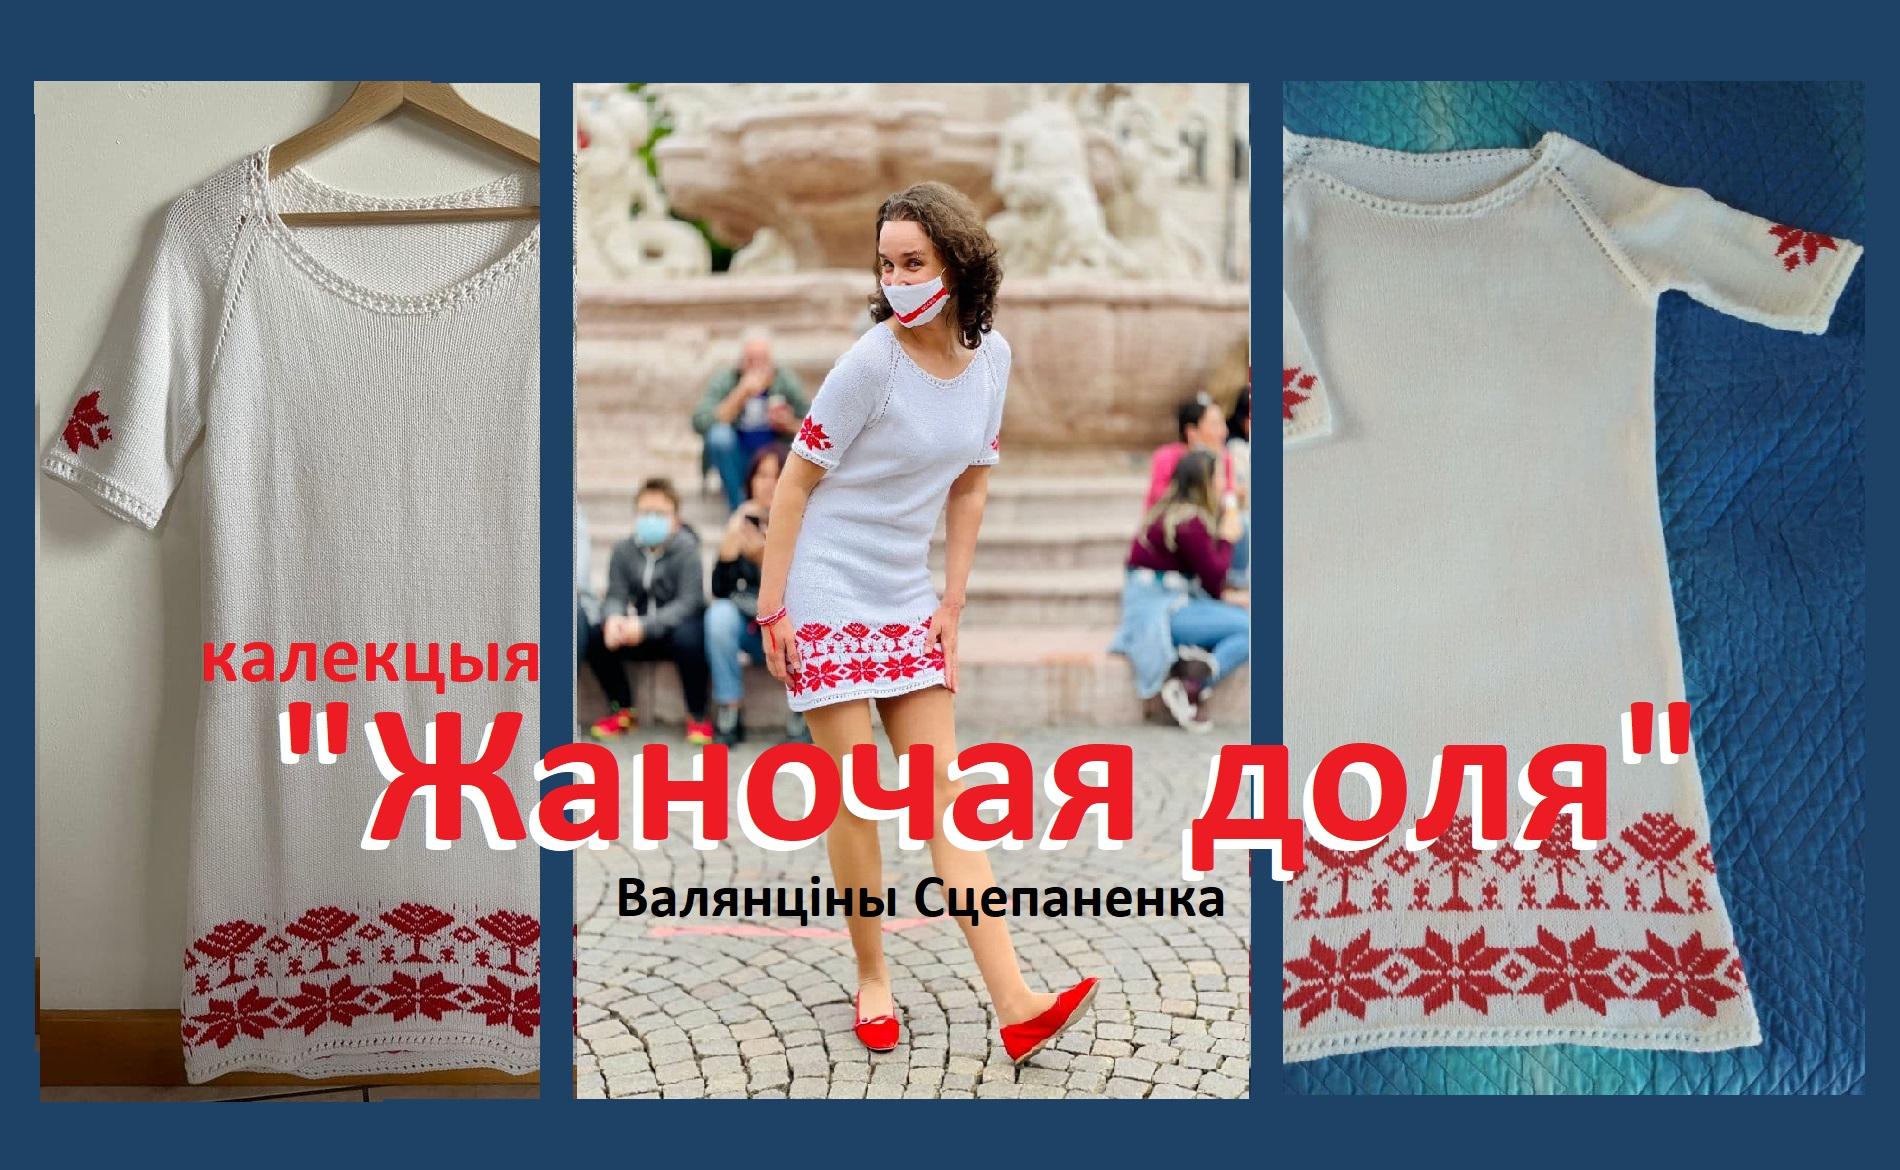 NEW participant! Valiantsina STEPANENKO & collection